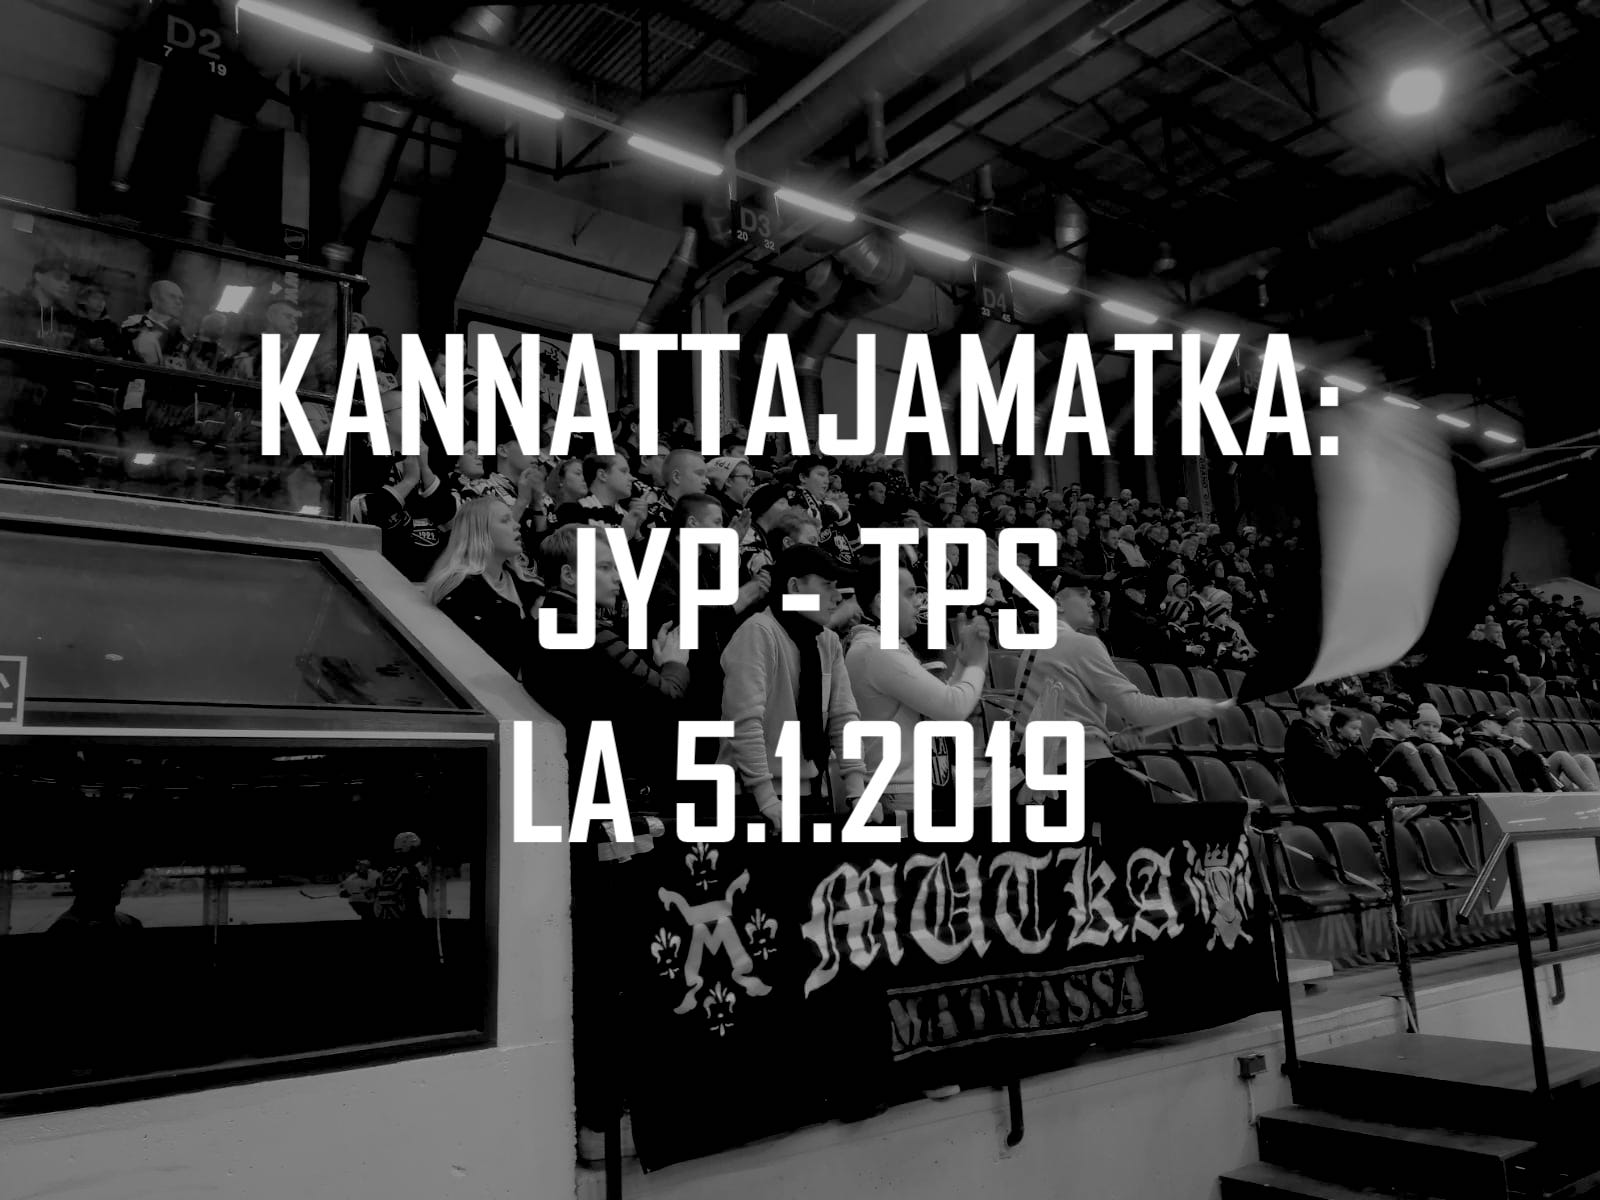 Kannattajamatka: JYP–TPS 5.1.2019